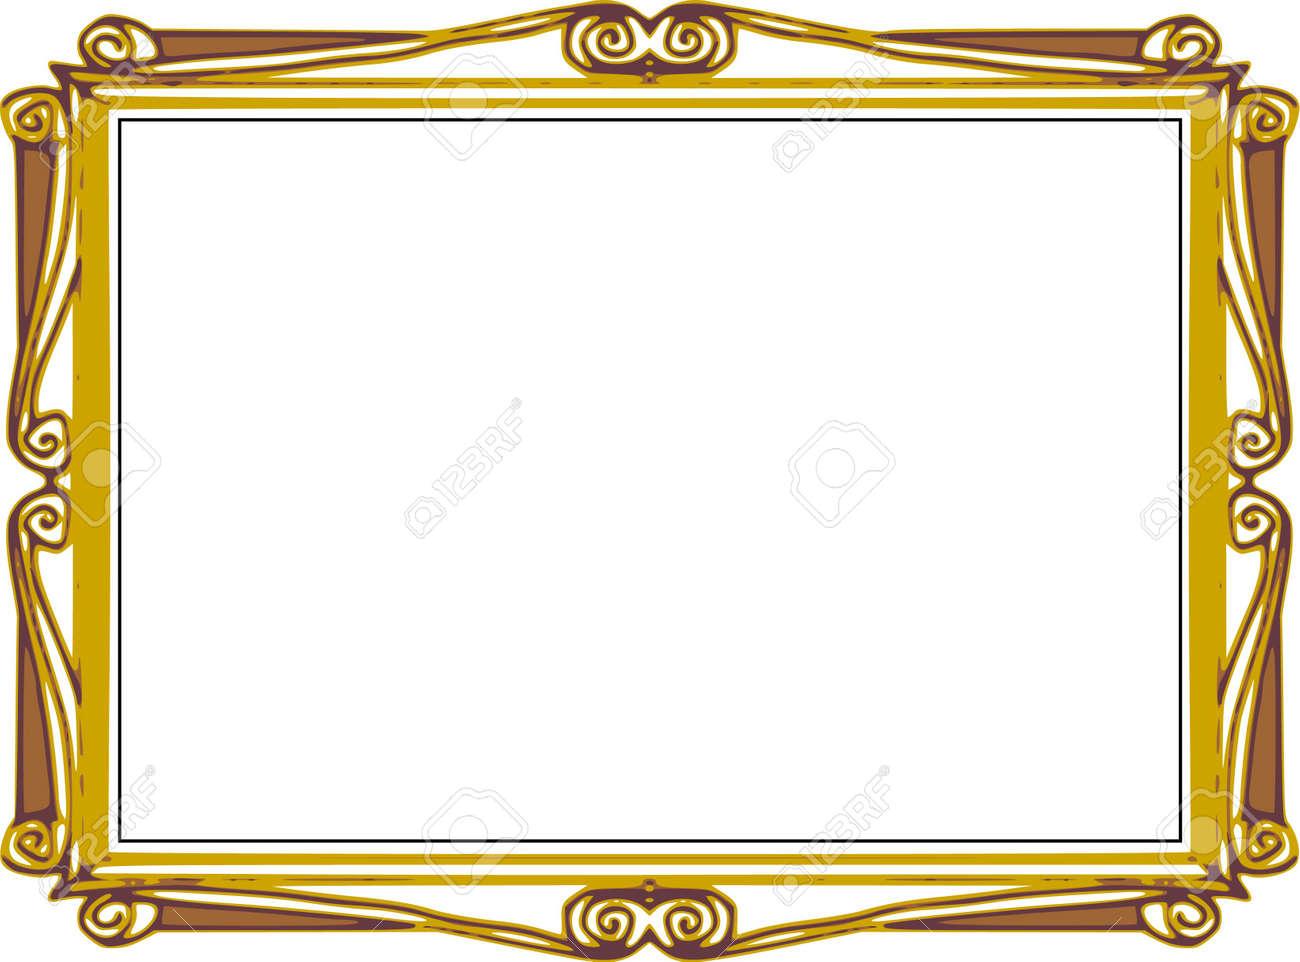 Background Series, Hand Draw Frame, Comics Cartoon Style Stock Photo ...